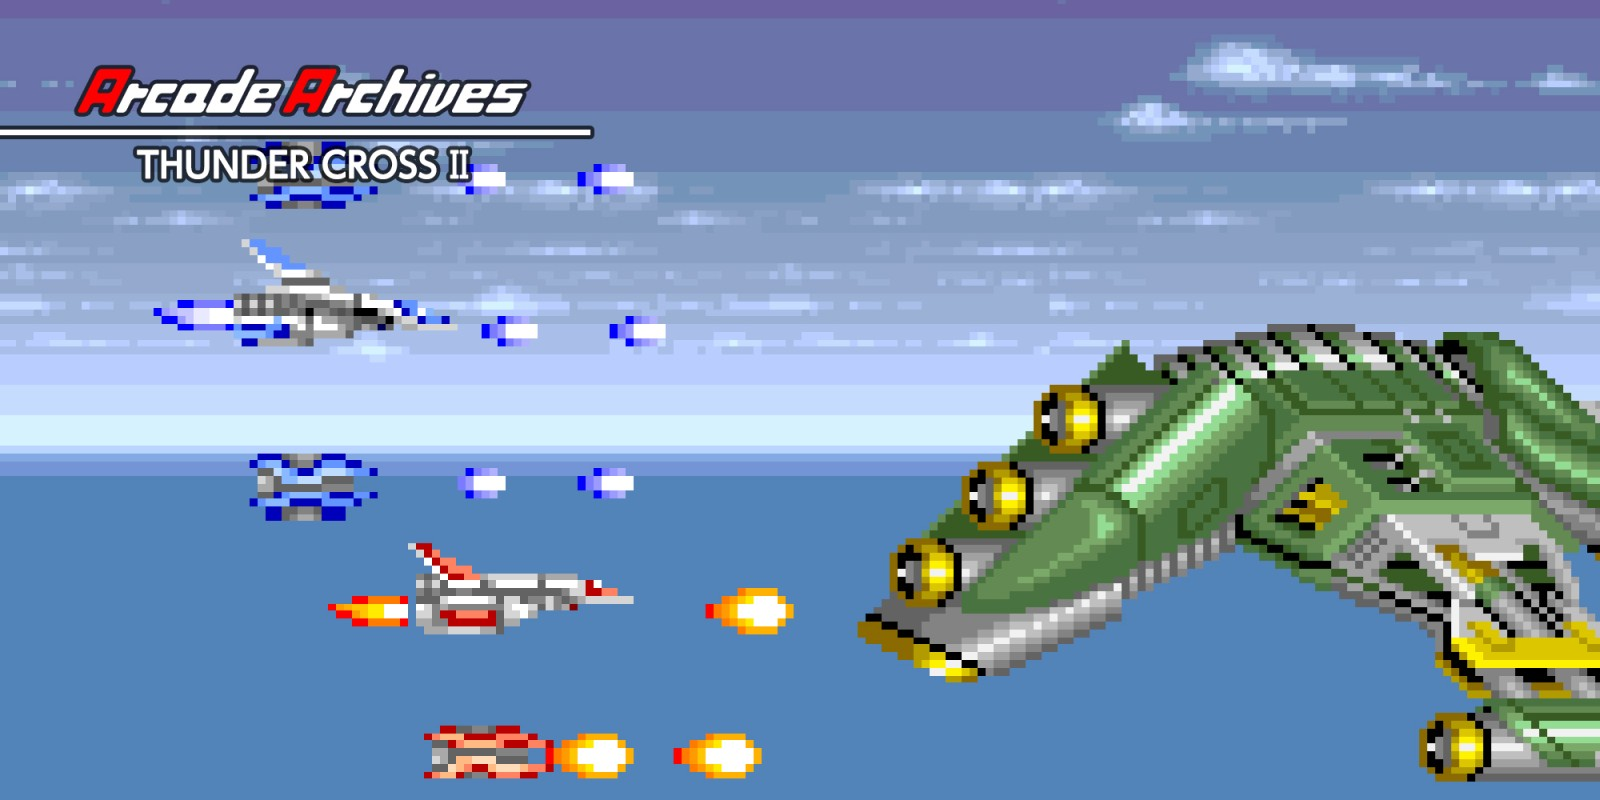 Arcade Archives THUNDER CROSS II